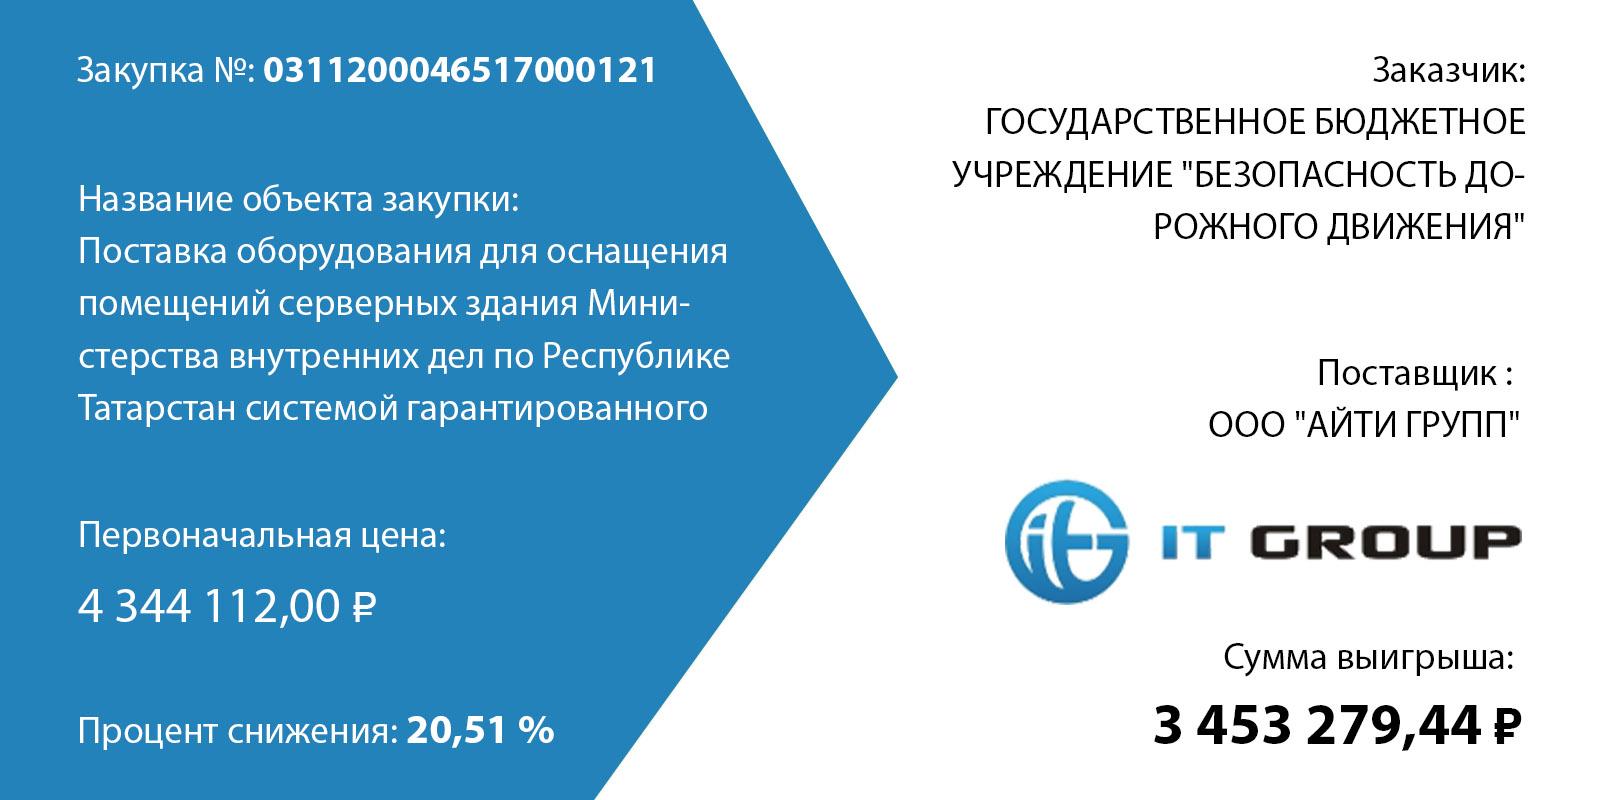 itgroup-3453279